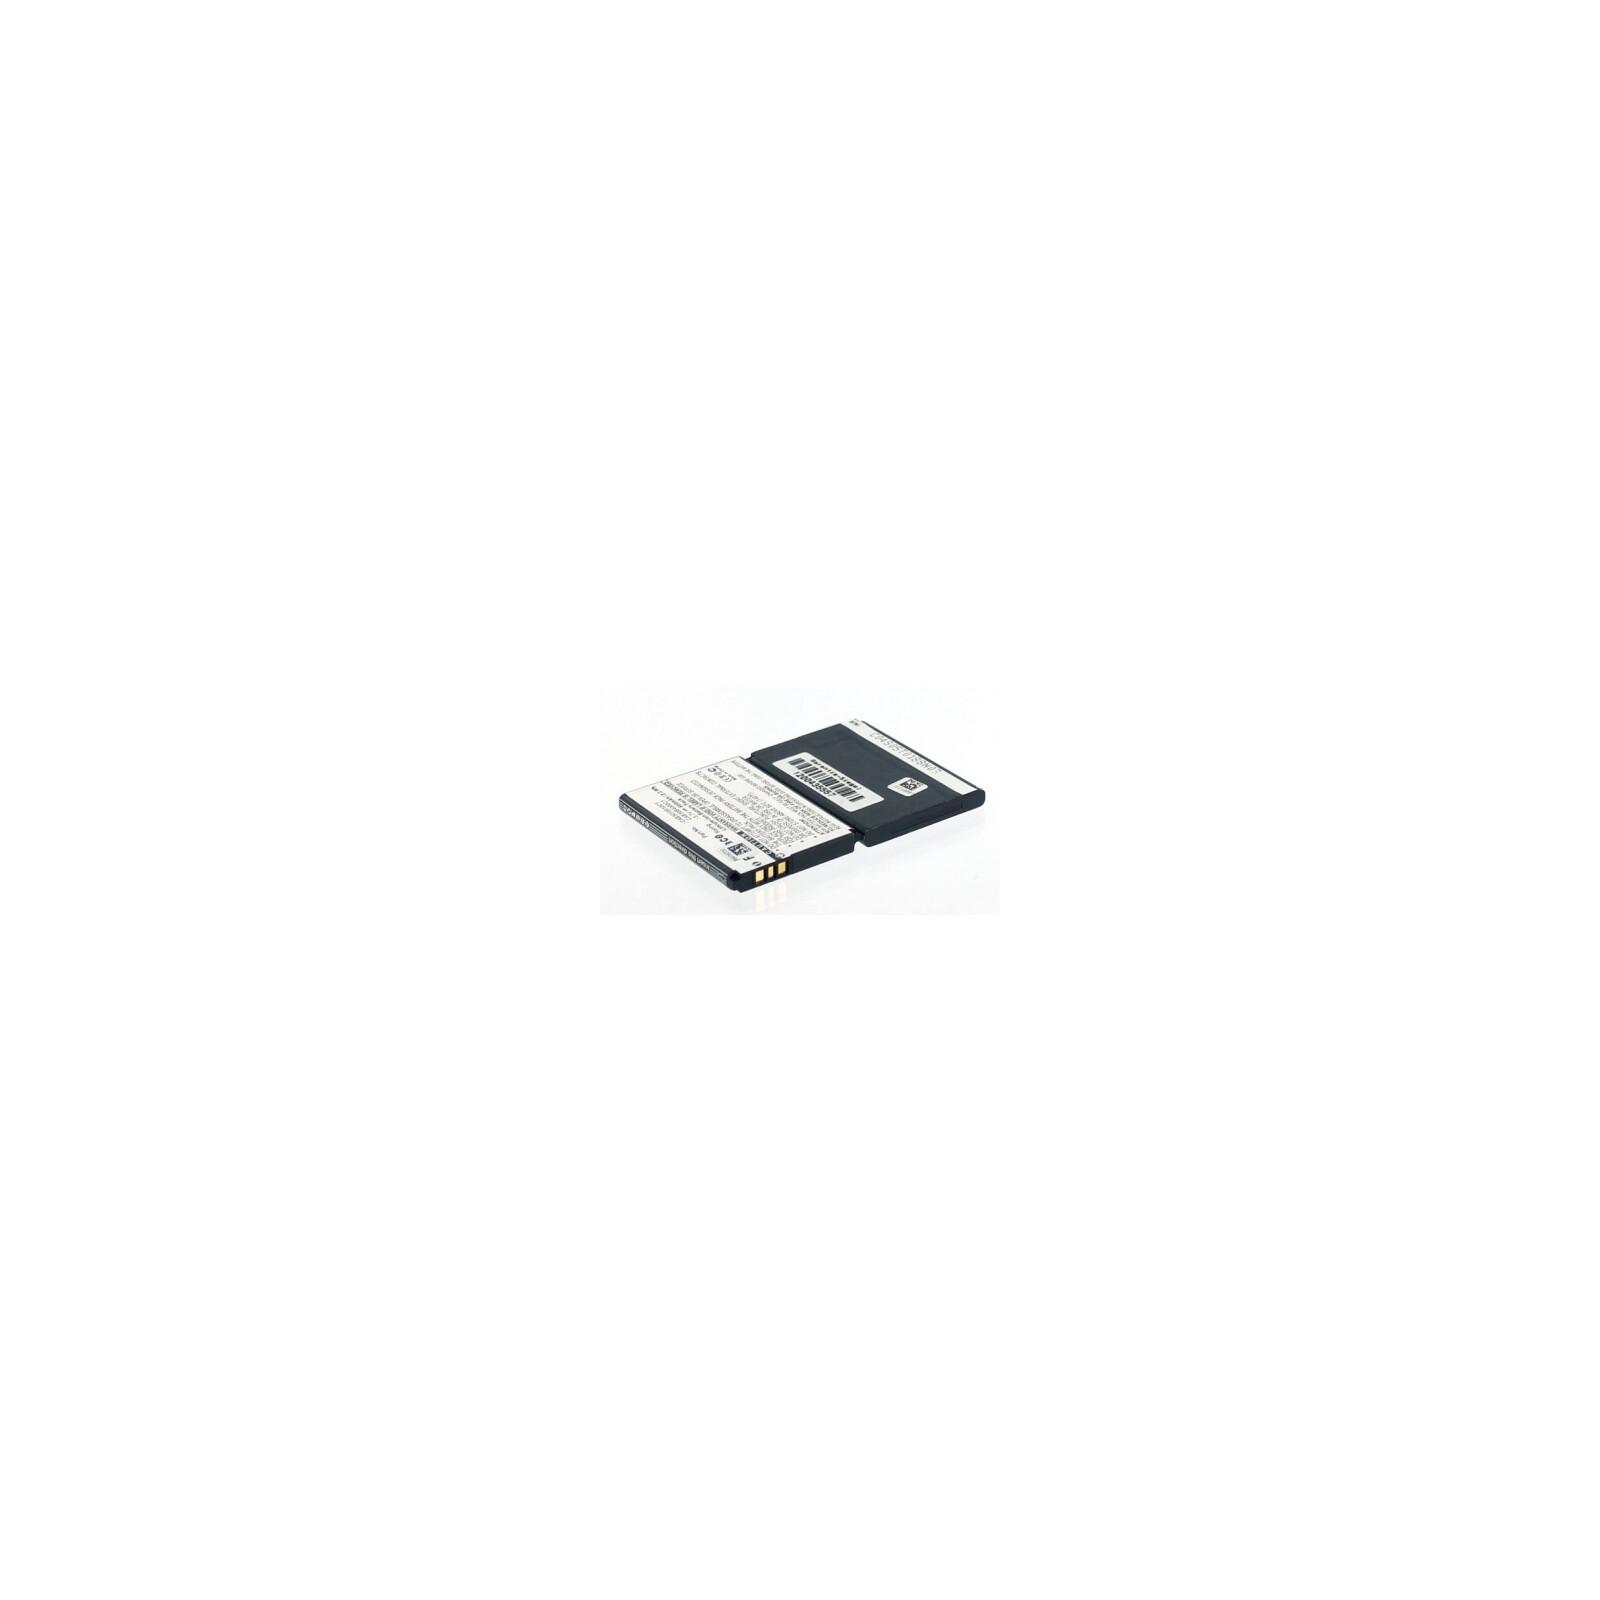 AGI Akku Alcatel One Touch 708 600mAh